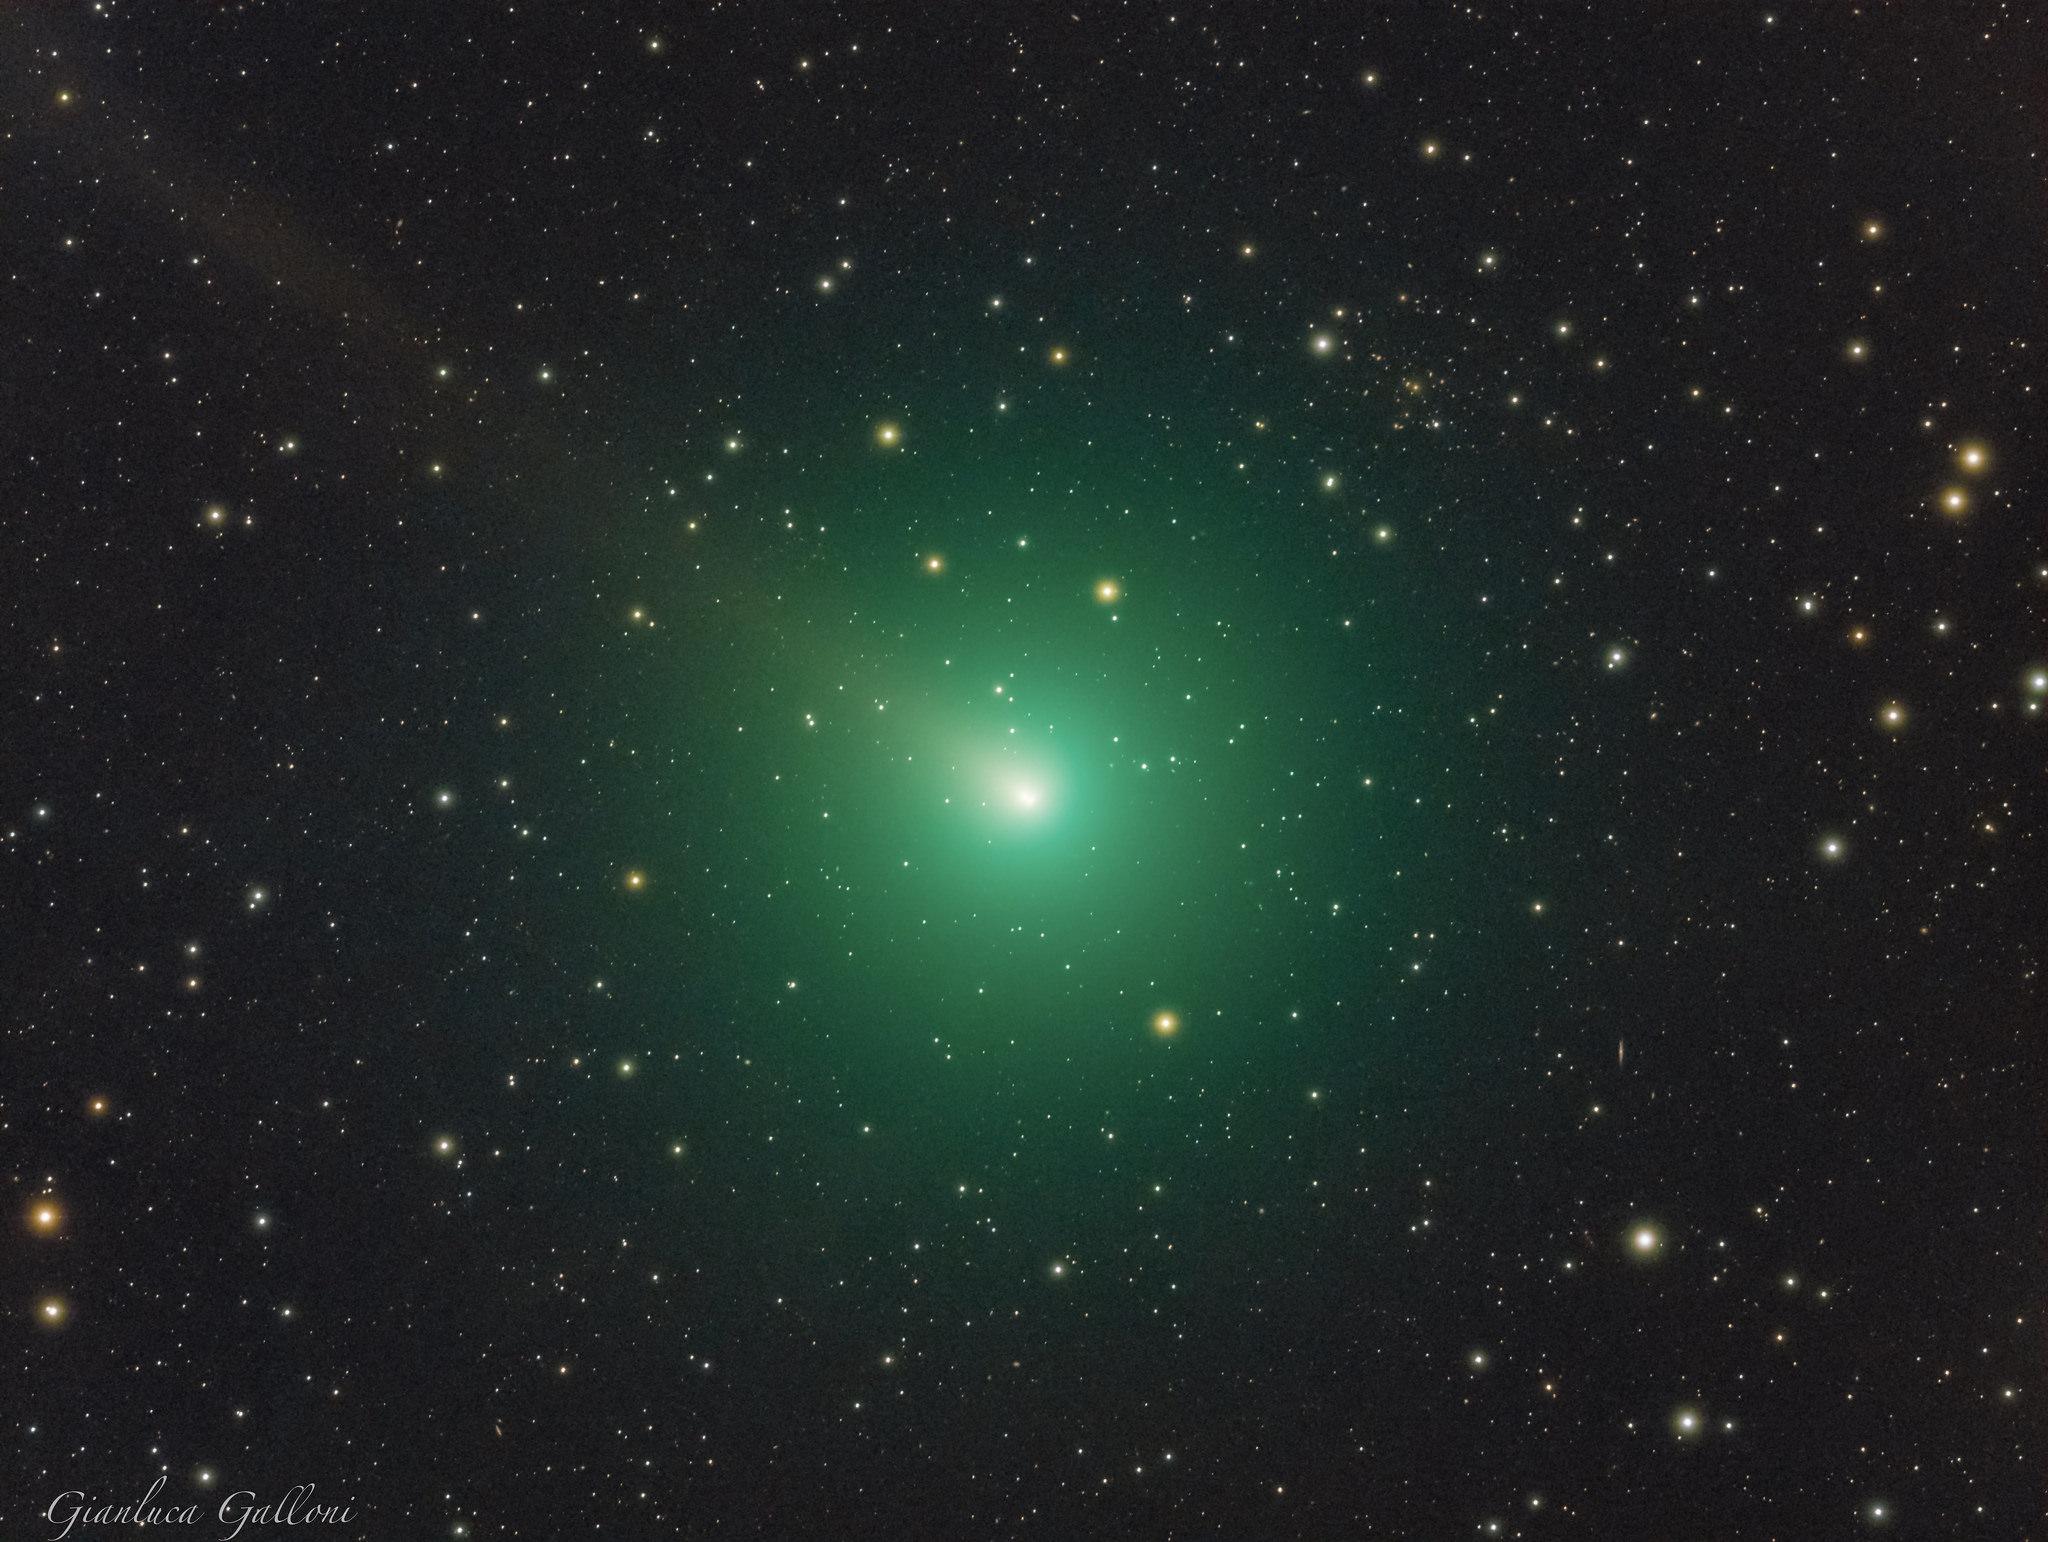 комета Виртанена 46p Wirtanen